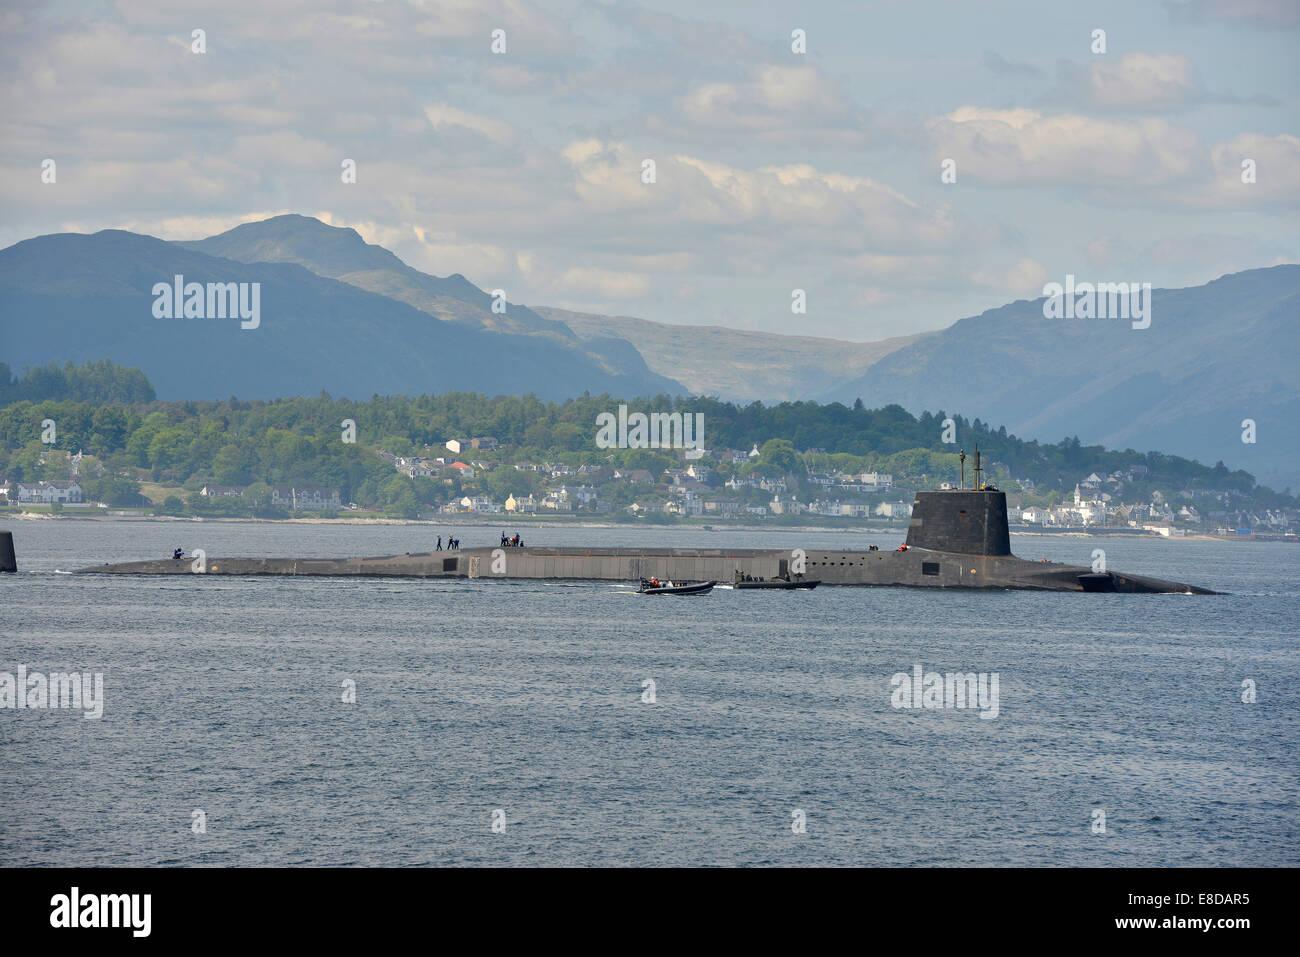 Submarino nuclear de la flota británica en el Firth of Clyde, Escocia Imagen De Stock